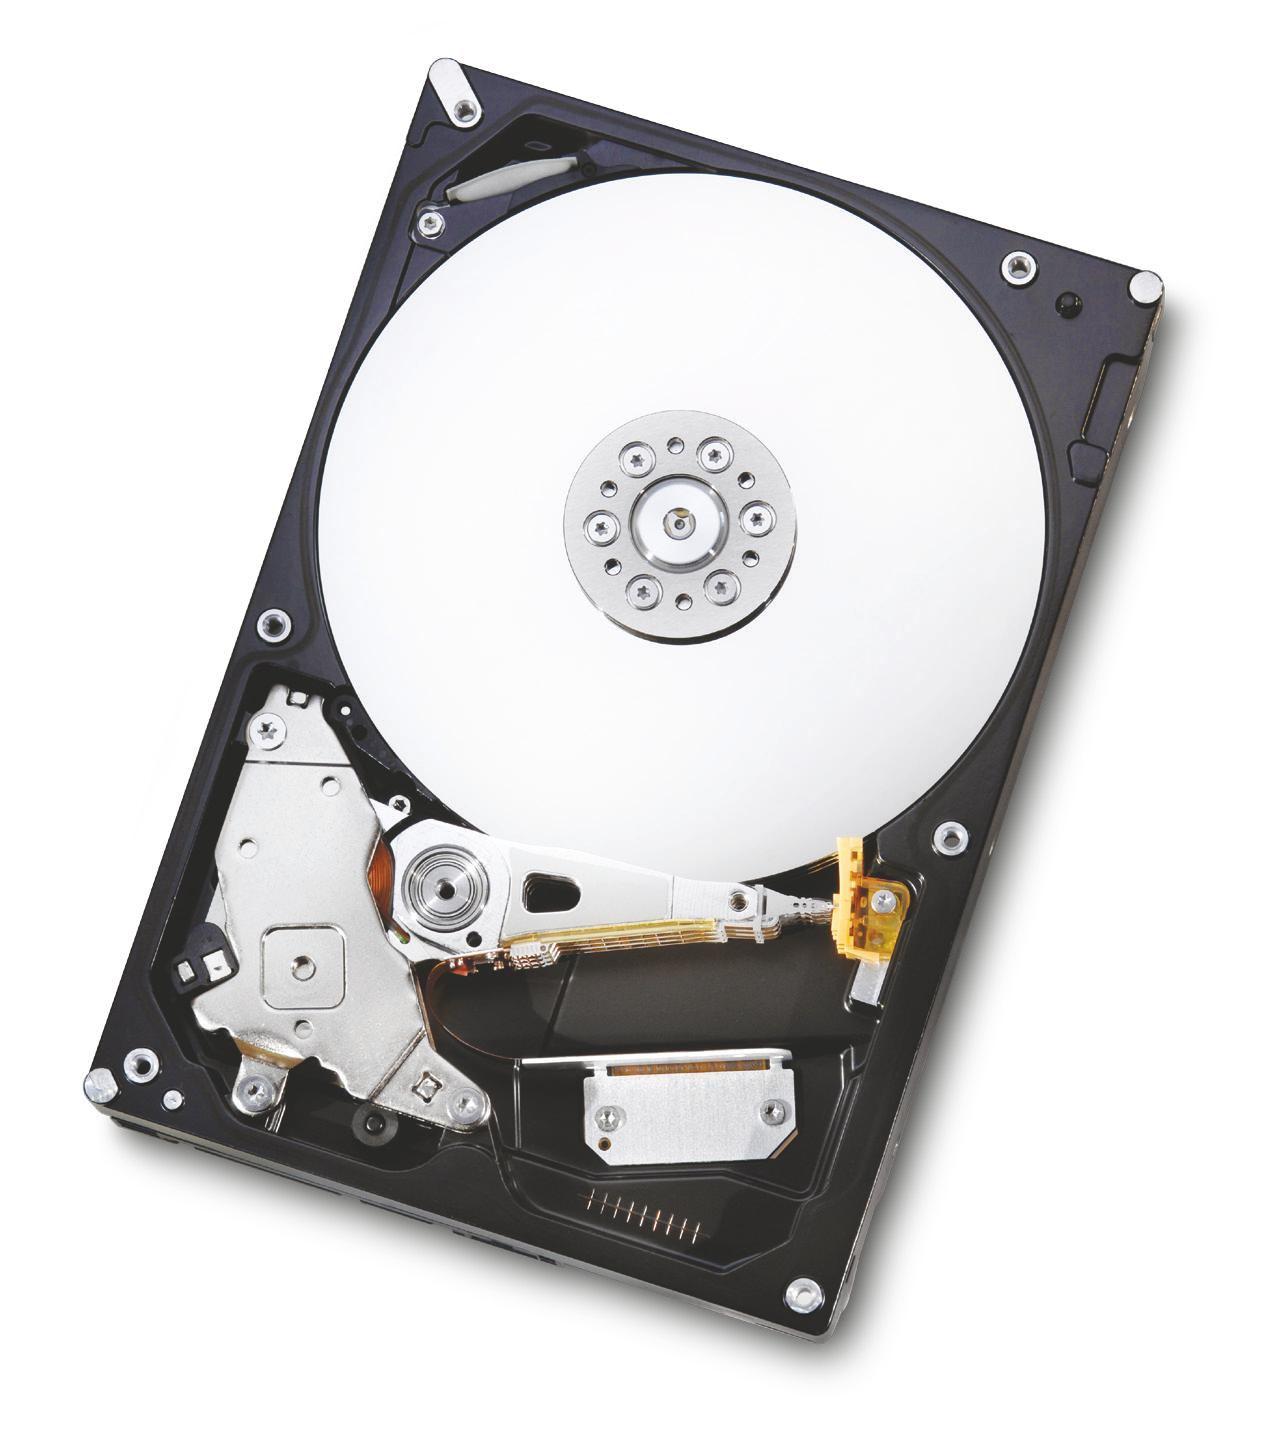 HGST DESKSTAR NAS 8000GB SERIAL ATA III DISCO RIGIDO INTERNO (DESKSTAR IDK 8TB N